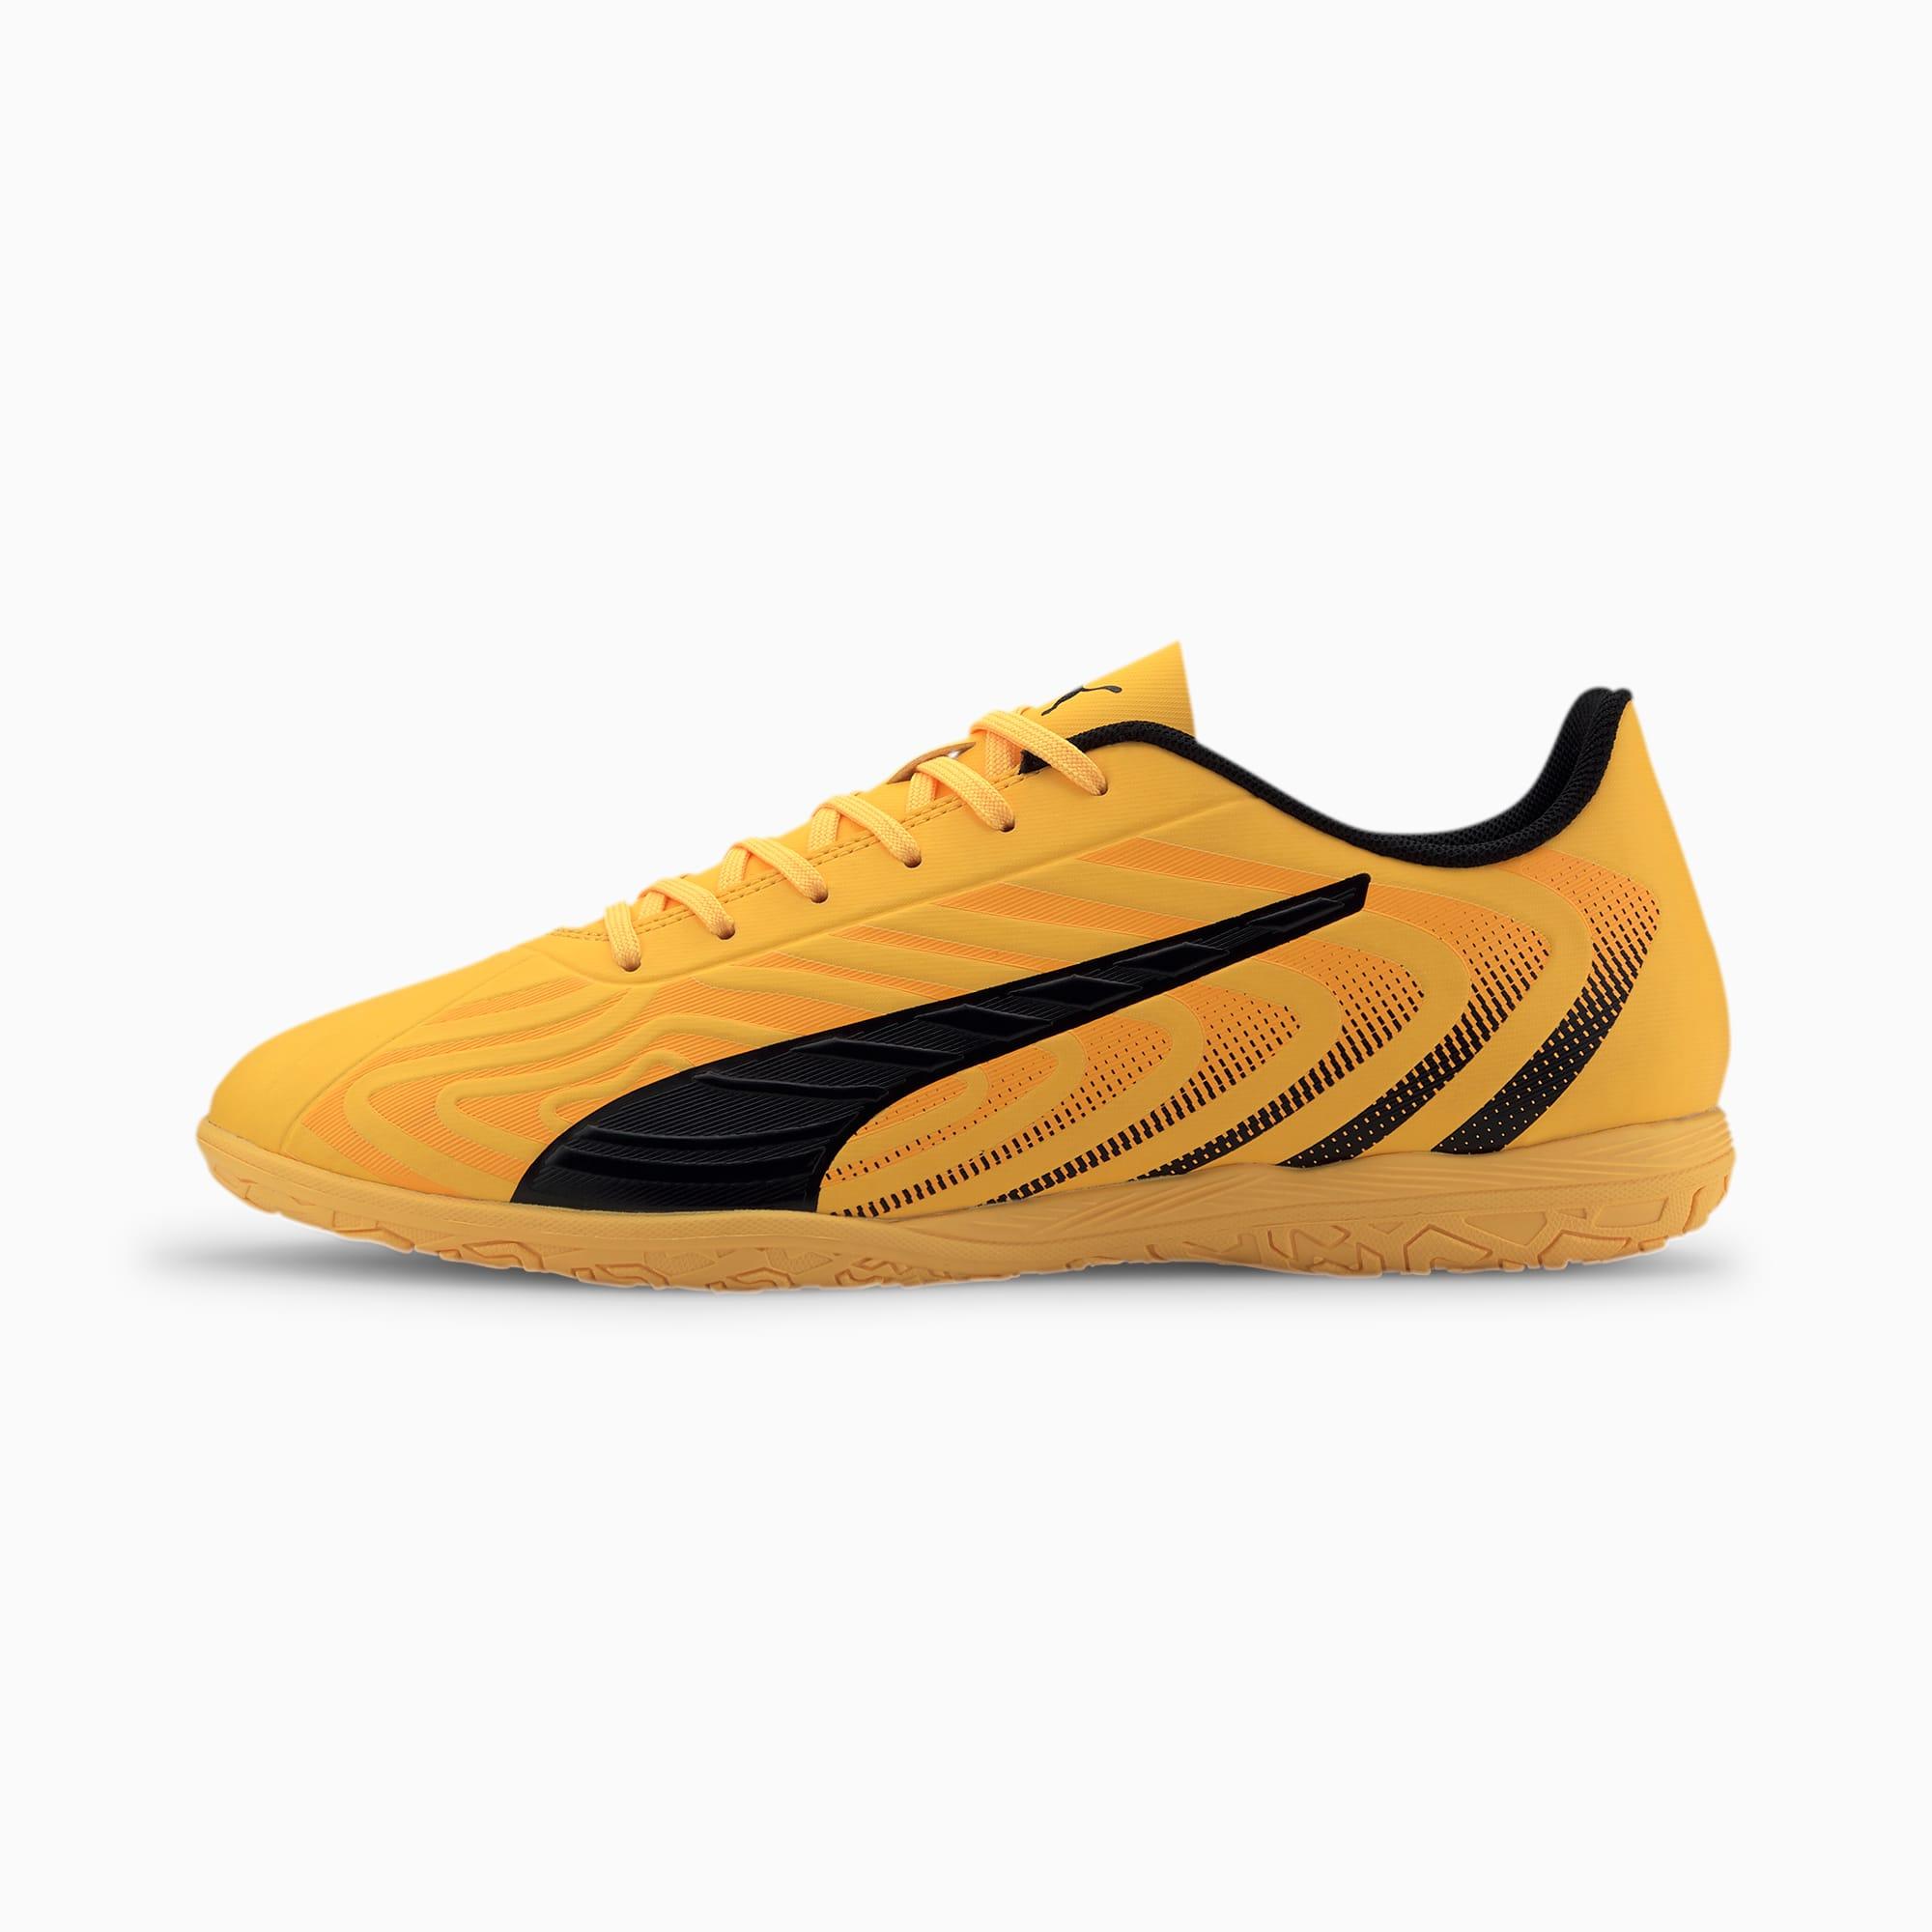 PUMA ONE 20.4 IT Men's Football Boots